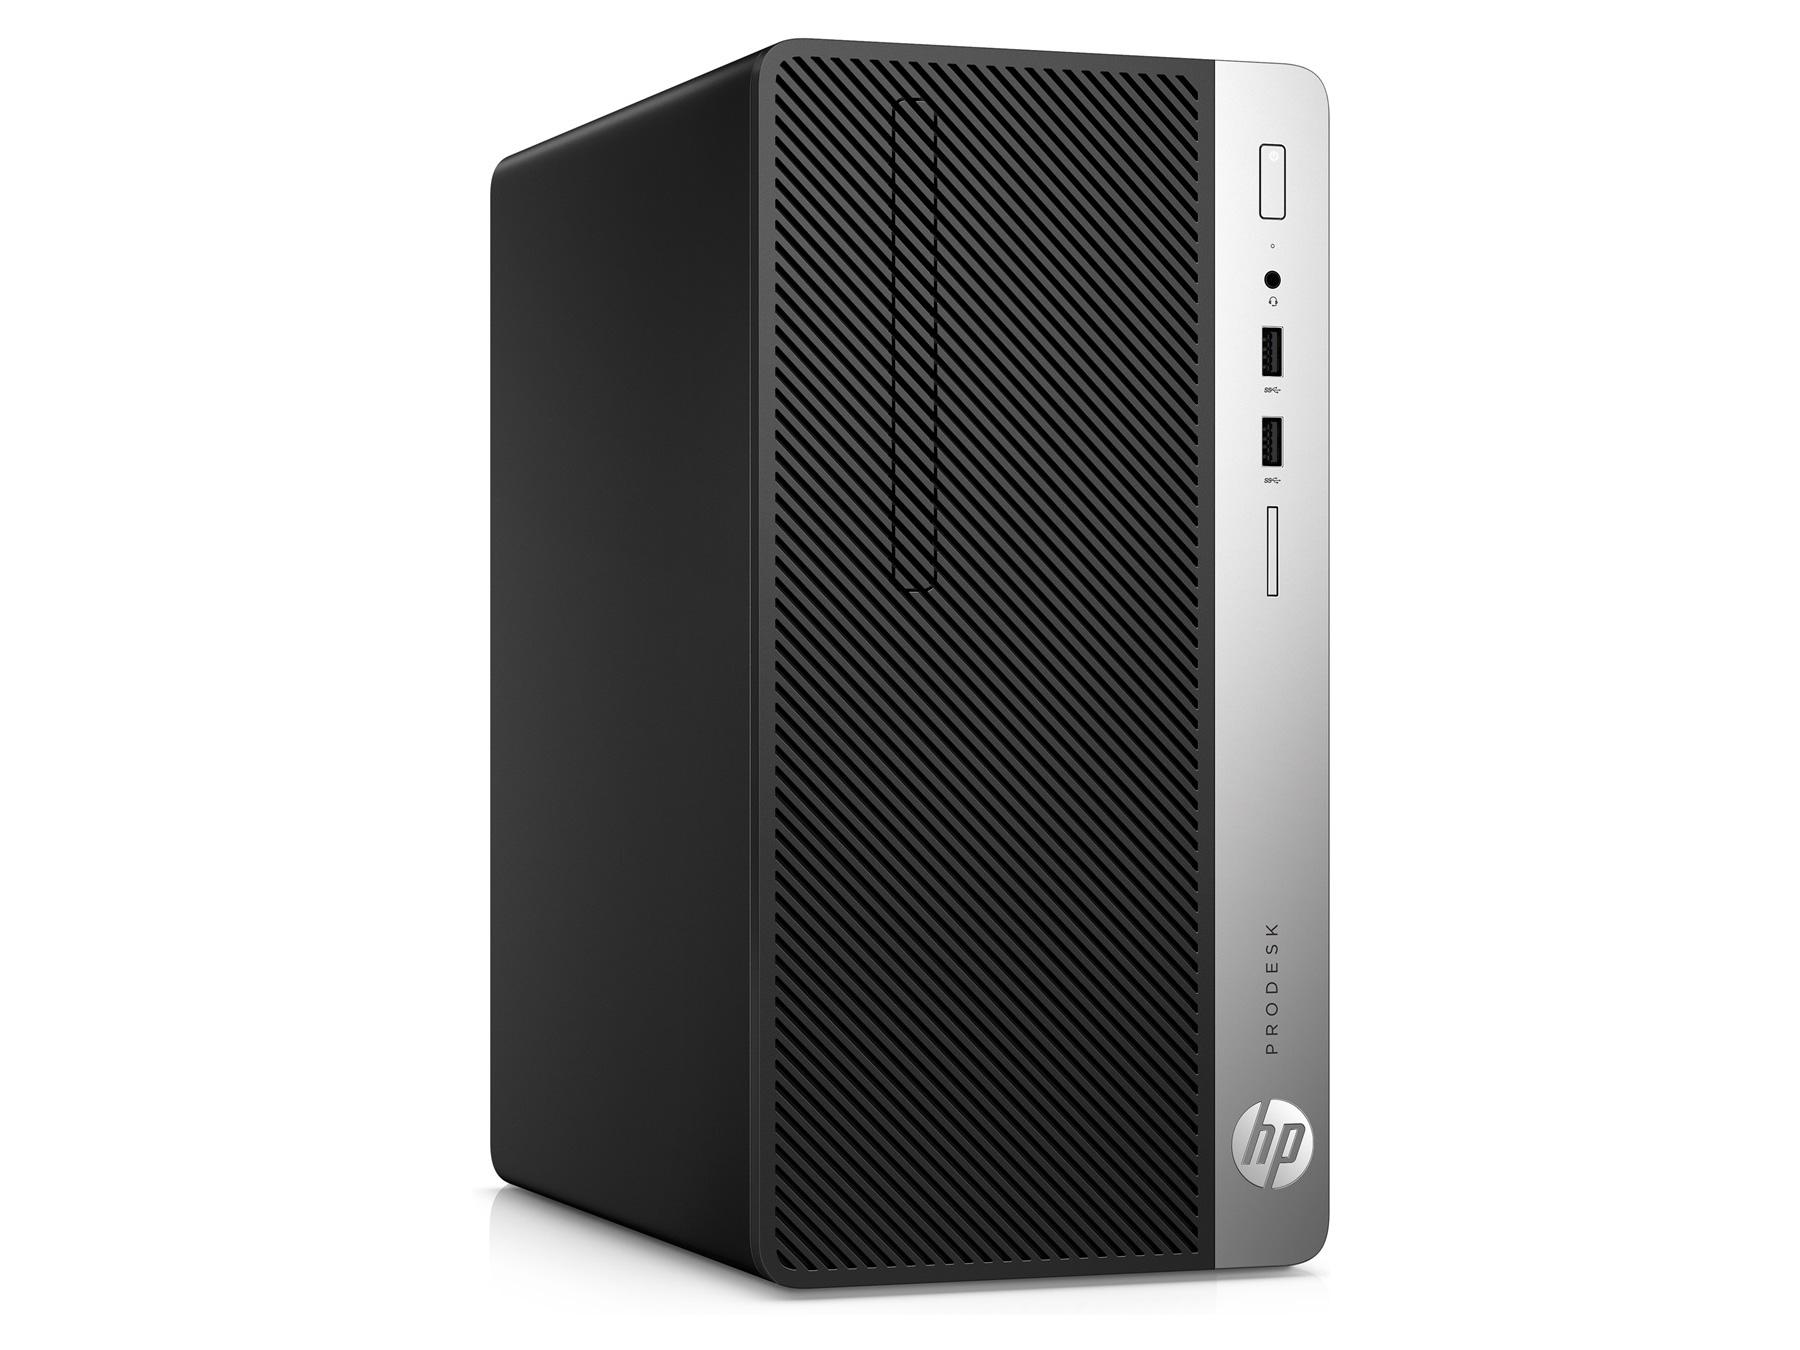 Máy tính để bàn HP ProDesk 400 G4 Desktop Mini - 4SA78PA